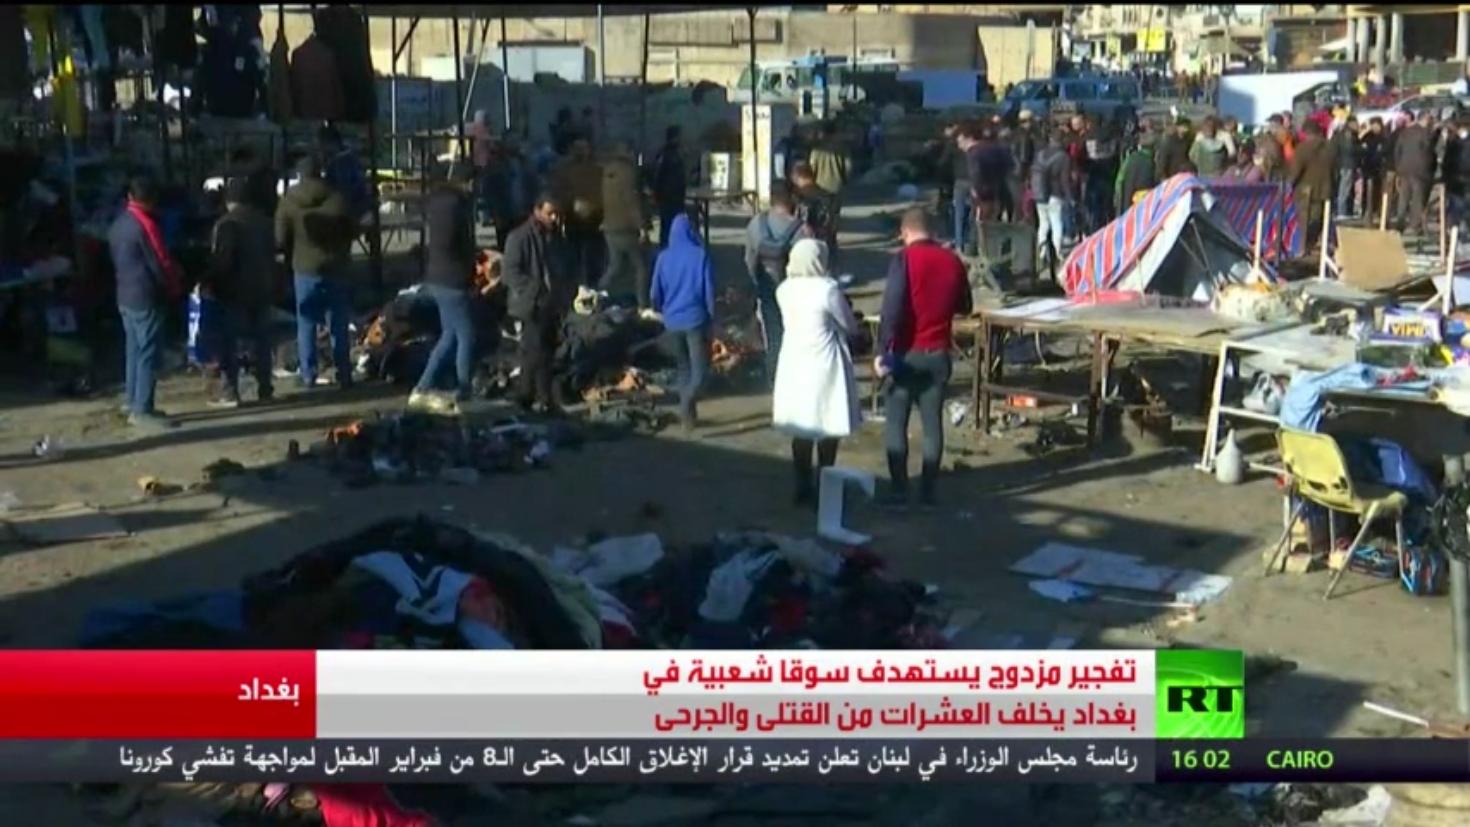 32 قتيلا و110 جرحى بتفجيرين في بغداد